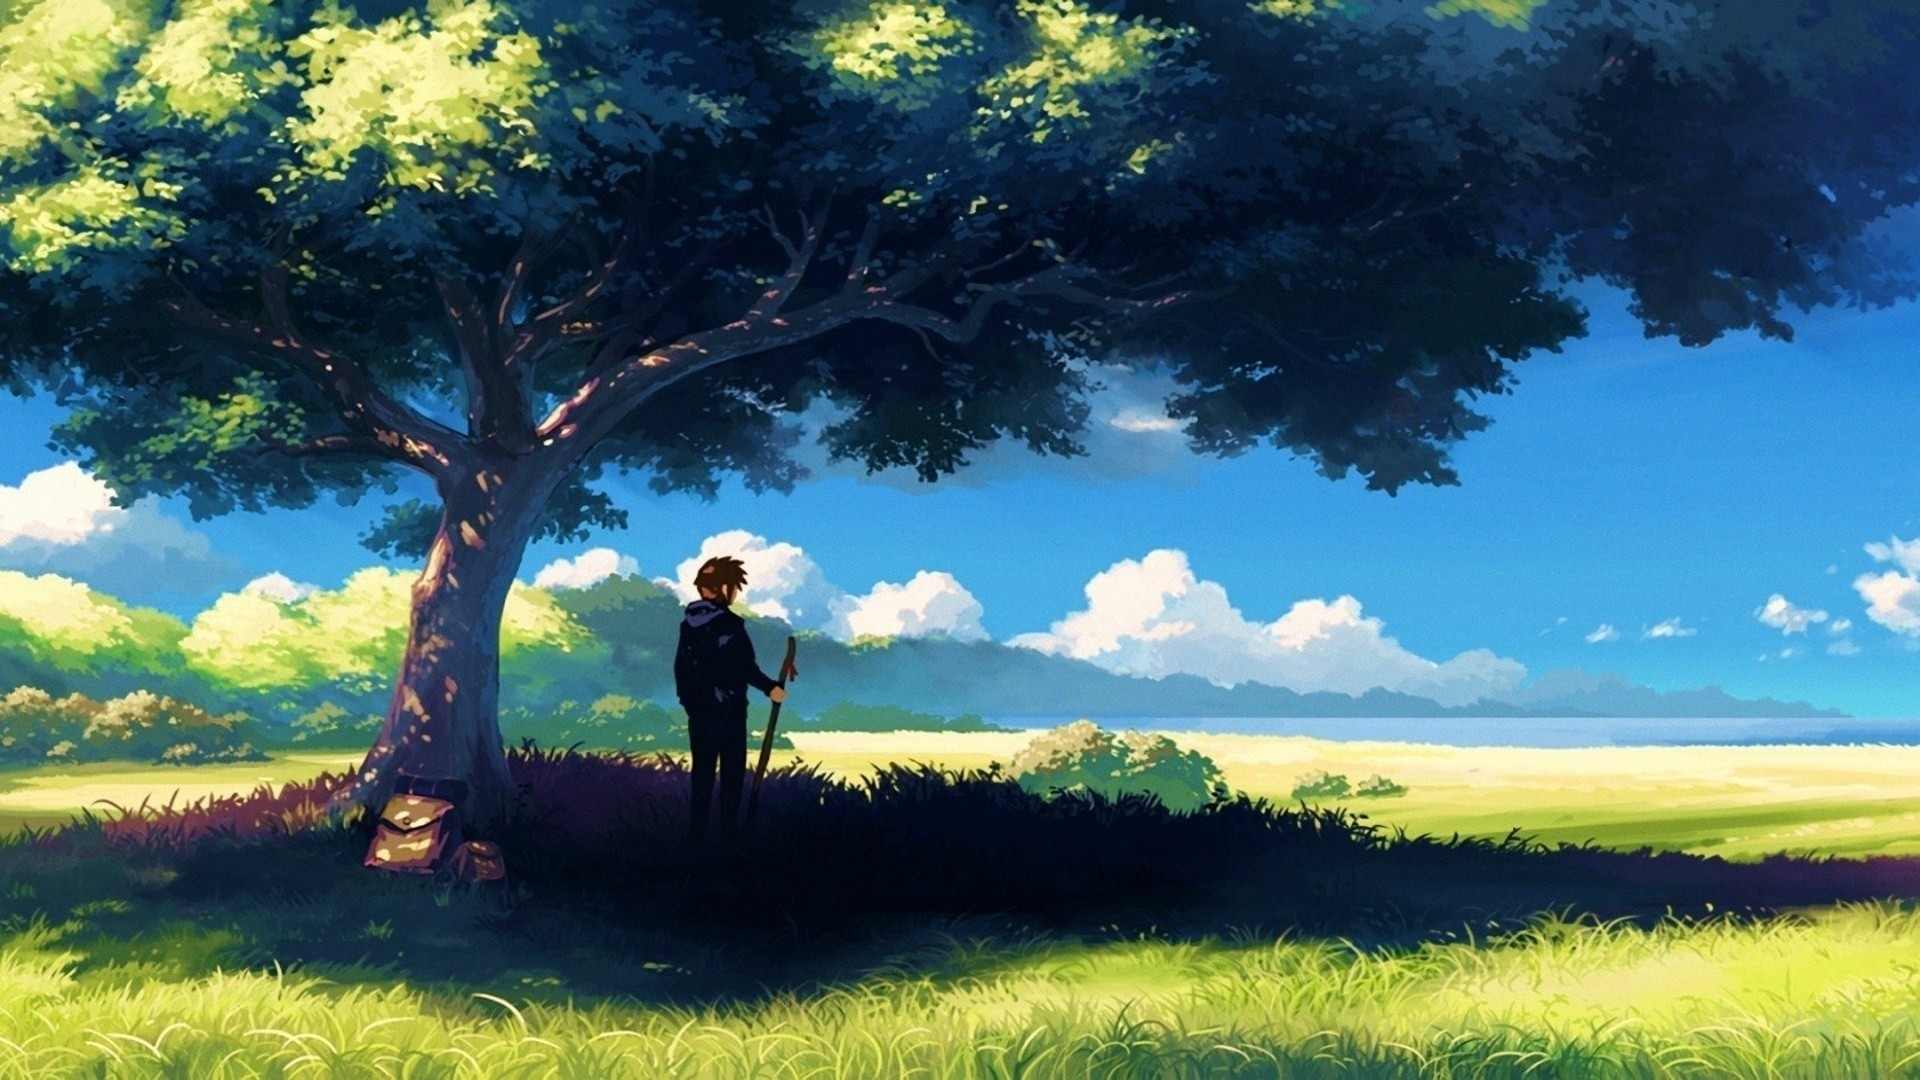 Anime Scenery High Quality